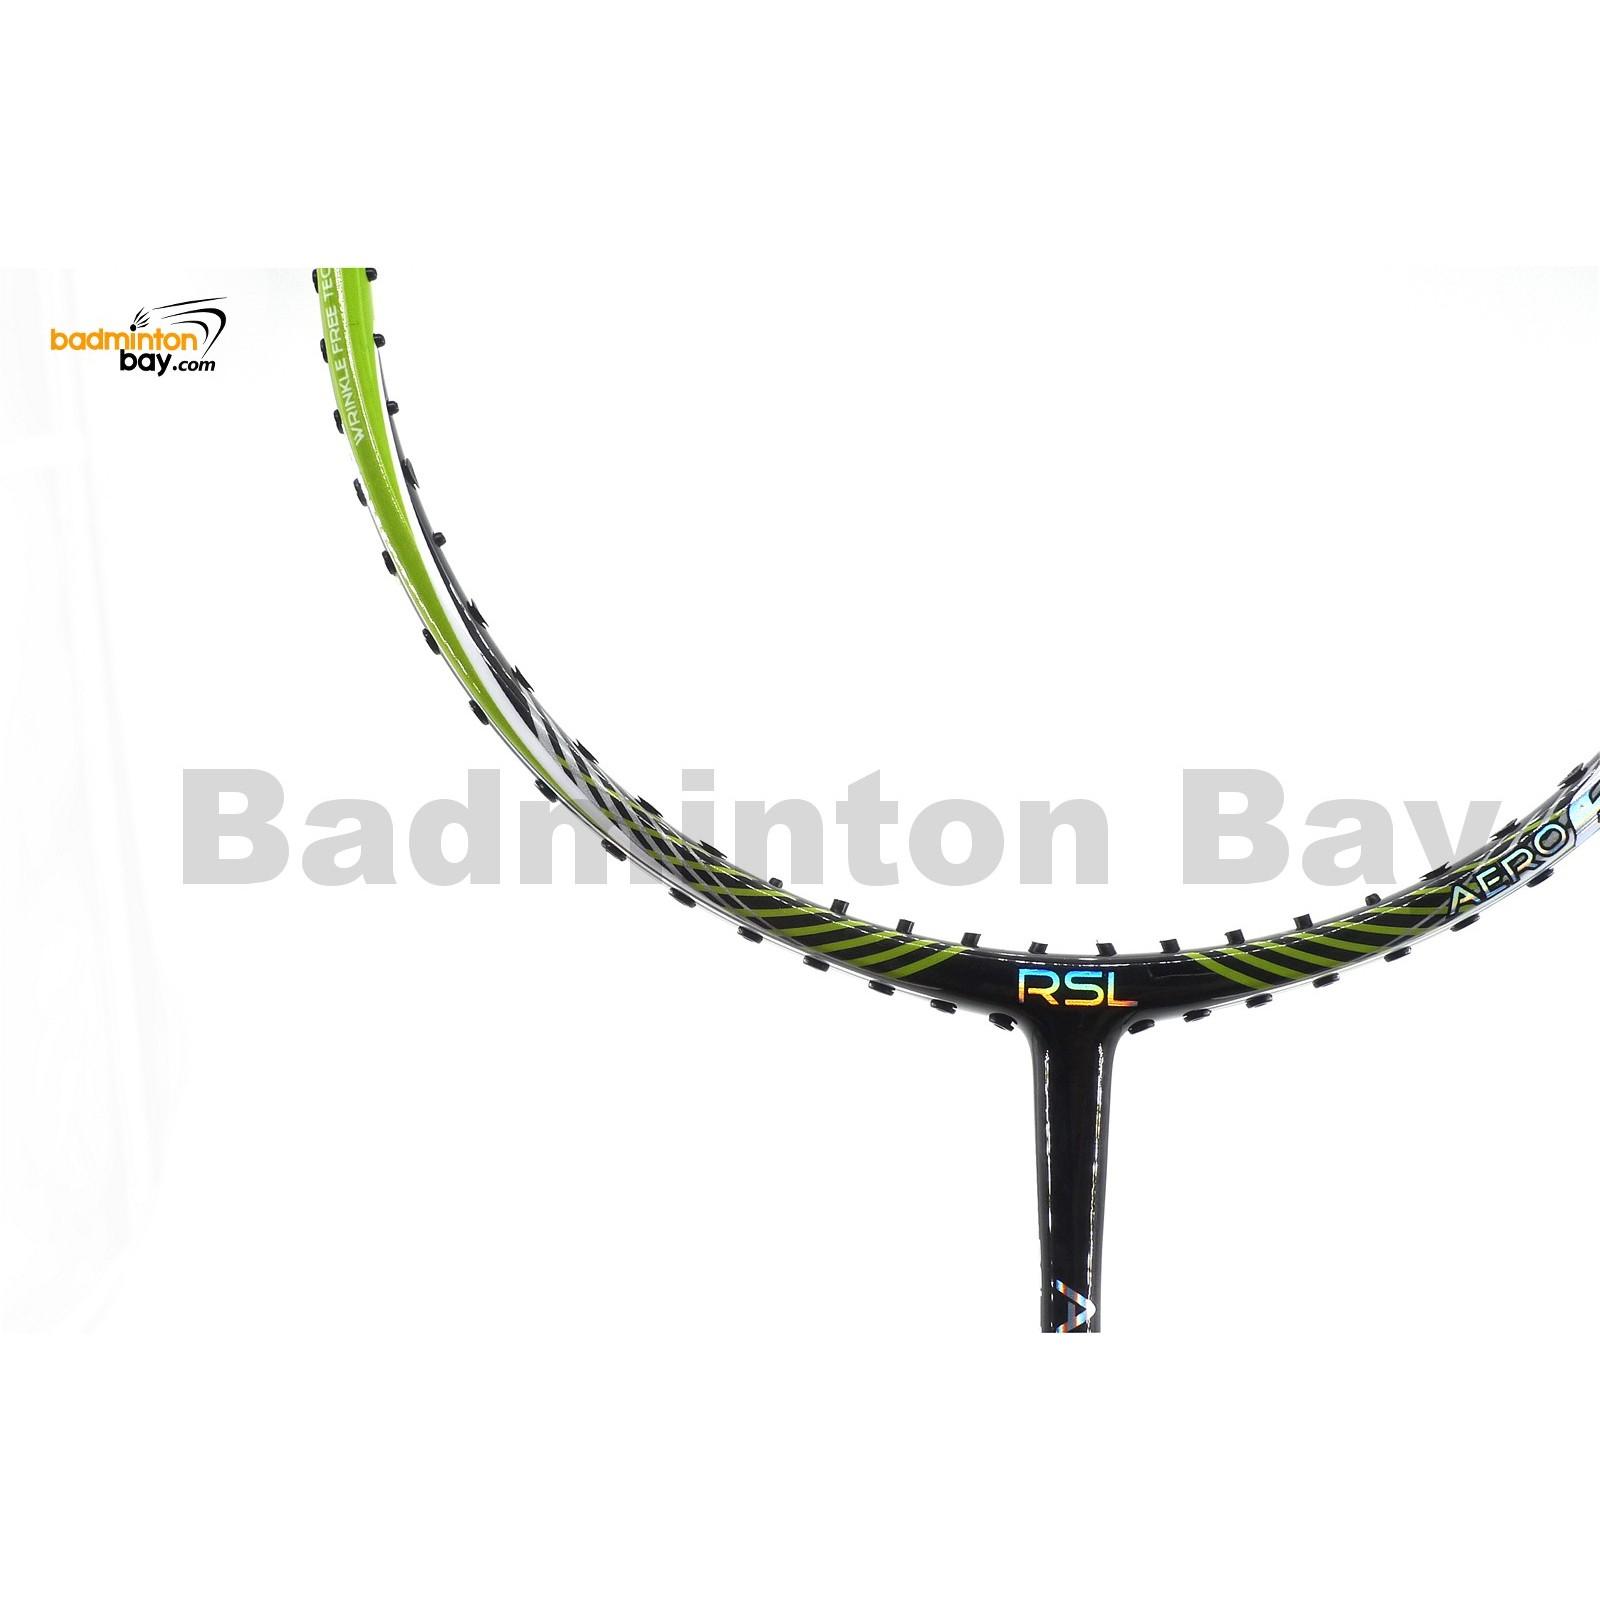 Rsl Aero 63 Badminton Racket 4u G5